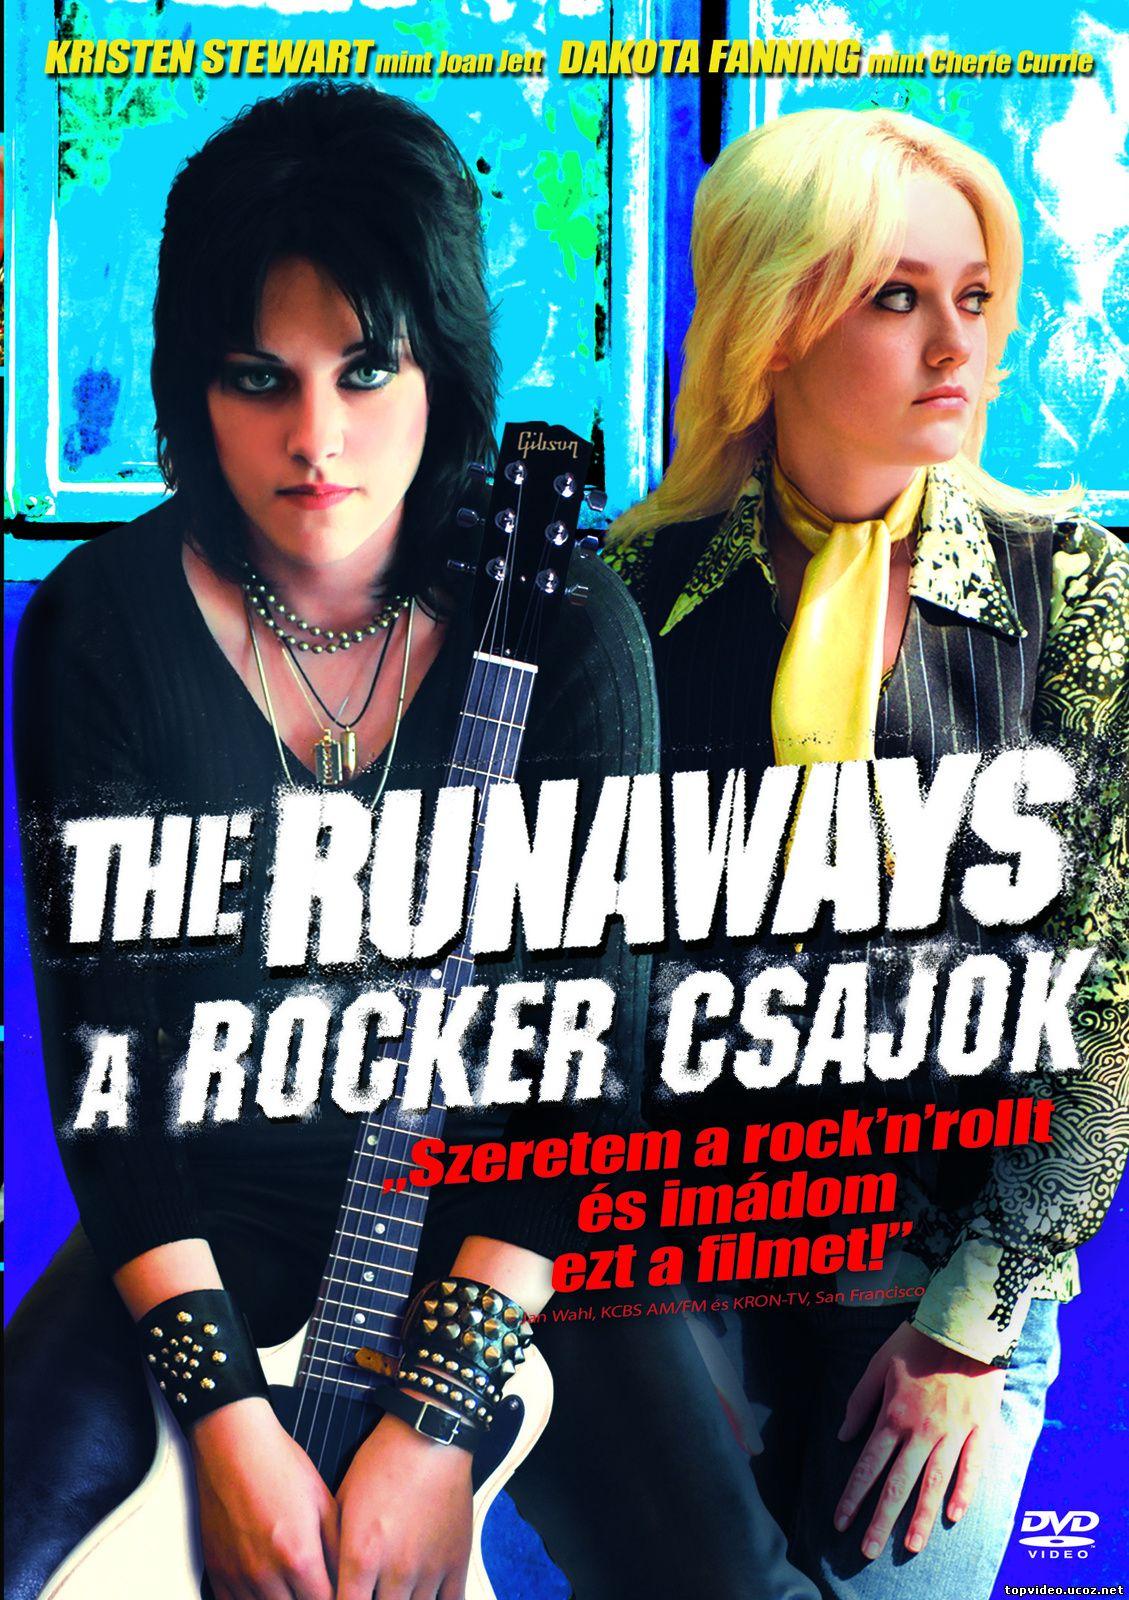 A Rocker csajok (2010) The Runaways